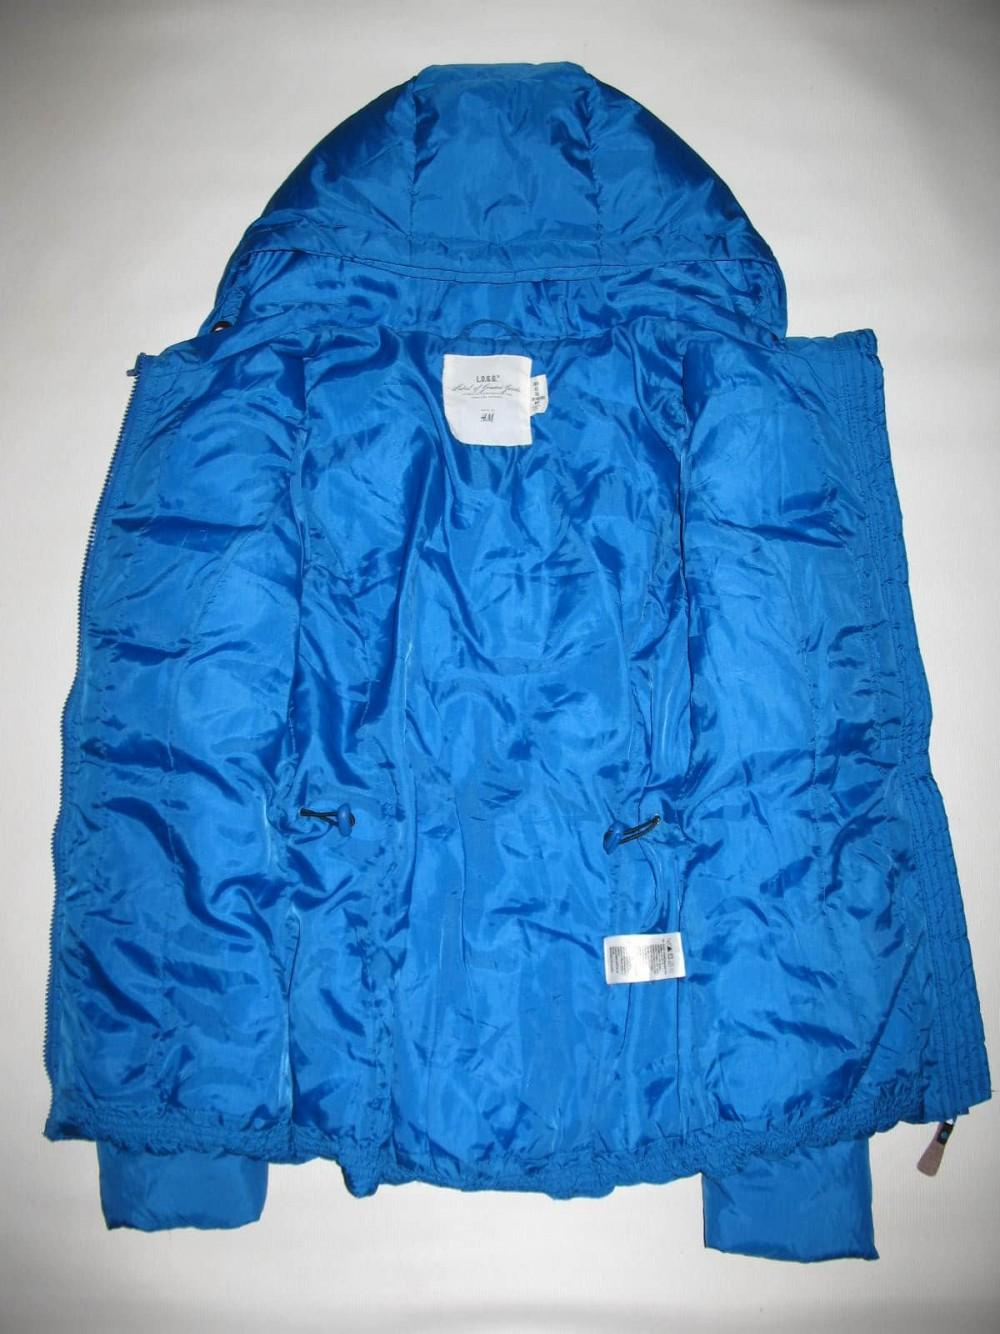 Куртка LOGG outdoor down jacket lady (размер S/XS) - 4